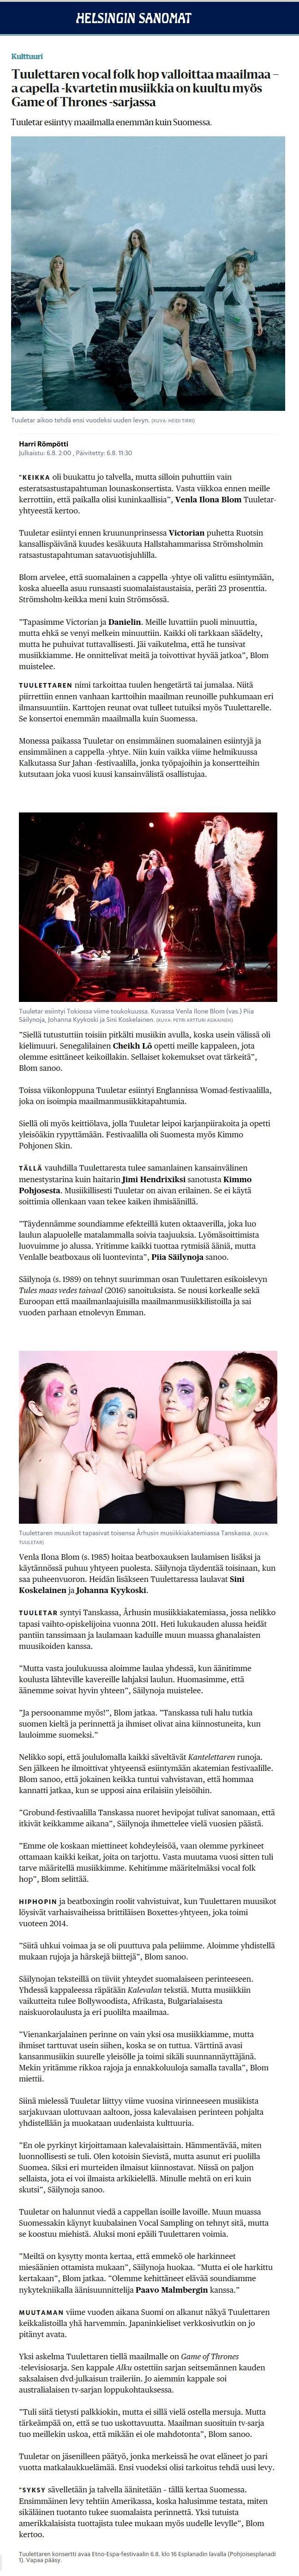 Helsingin Sanomat, 6.8.2018